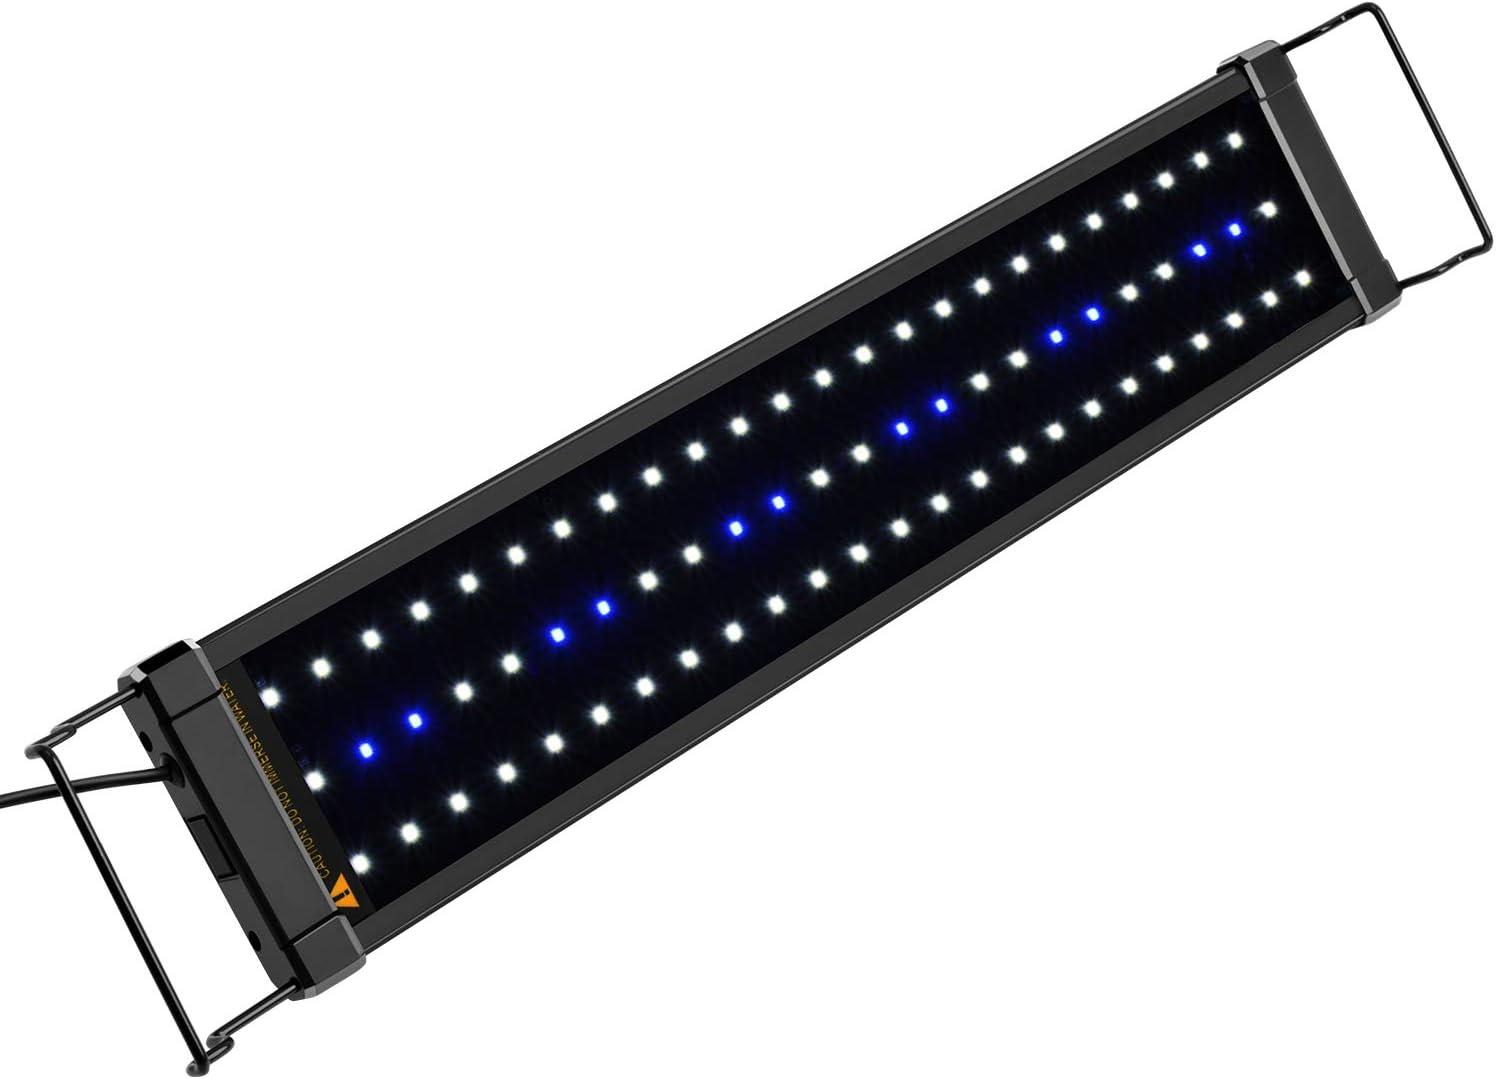 NICREW ClassicLED Luz LED Acuario, Pantalla LED Acuario, Iluminación LED para Acuarios Plantados Lámpara LED para Peceras 53-83 cm, 11W, 7000K